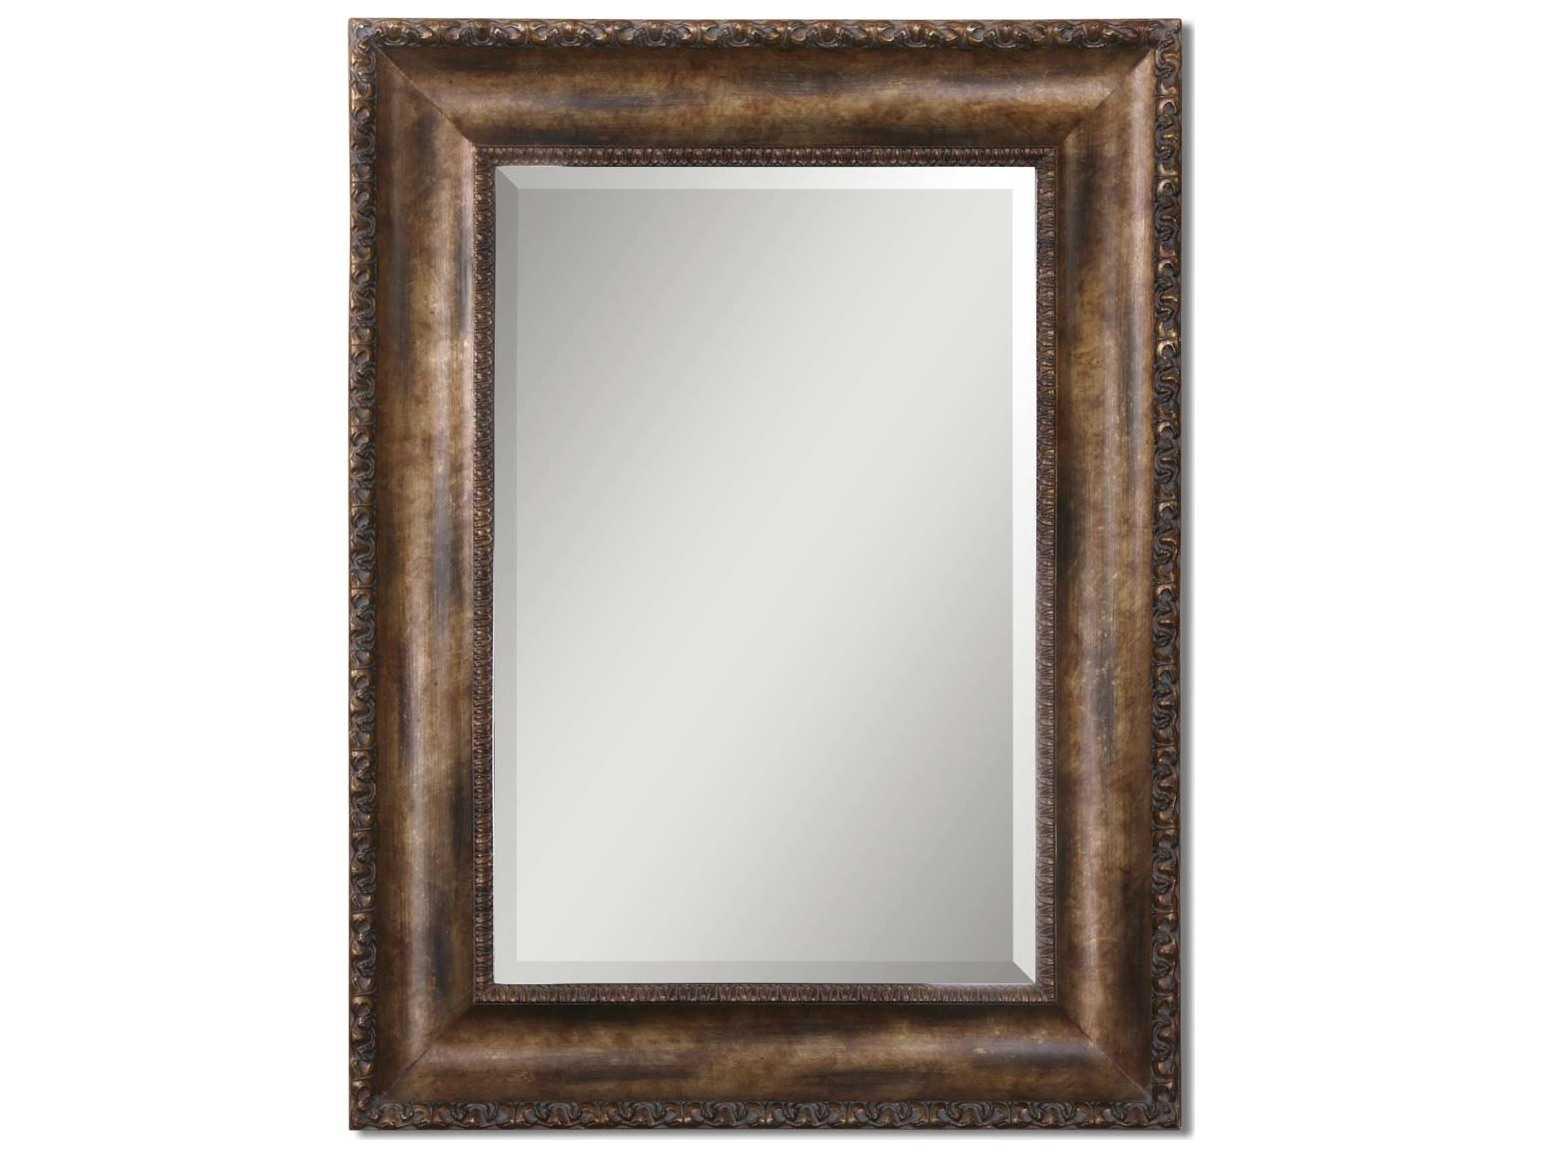 Uttermost leola 36 x 48 antique bronze wall mirror ut14441b for Mirror 48 x 36